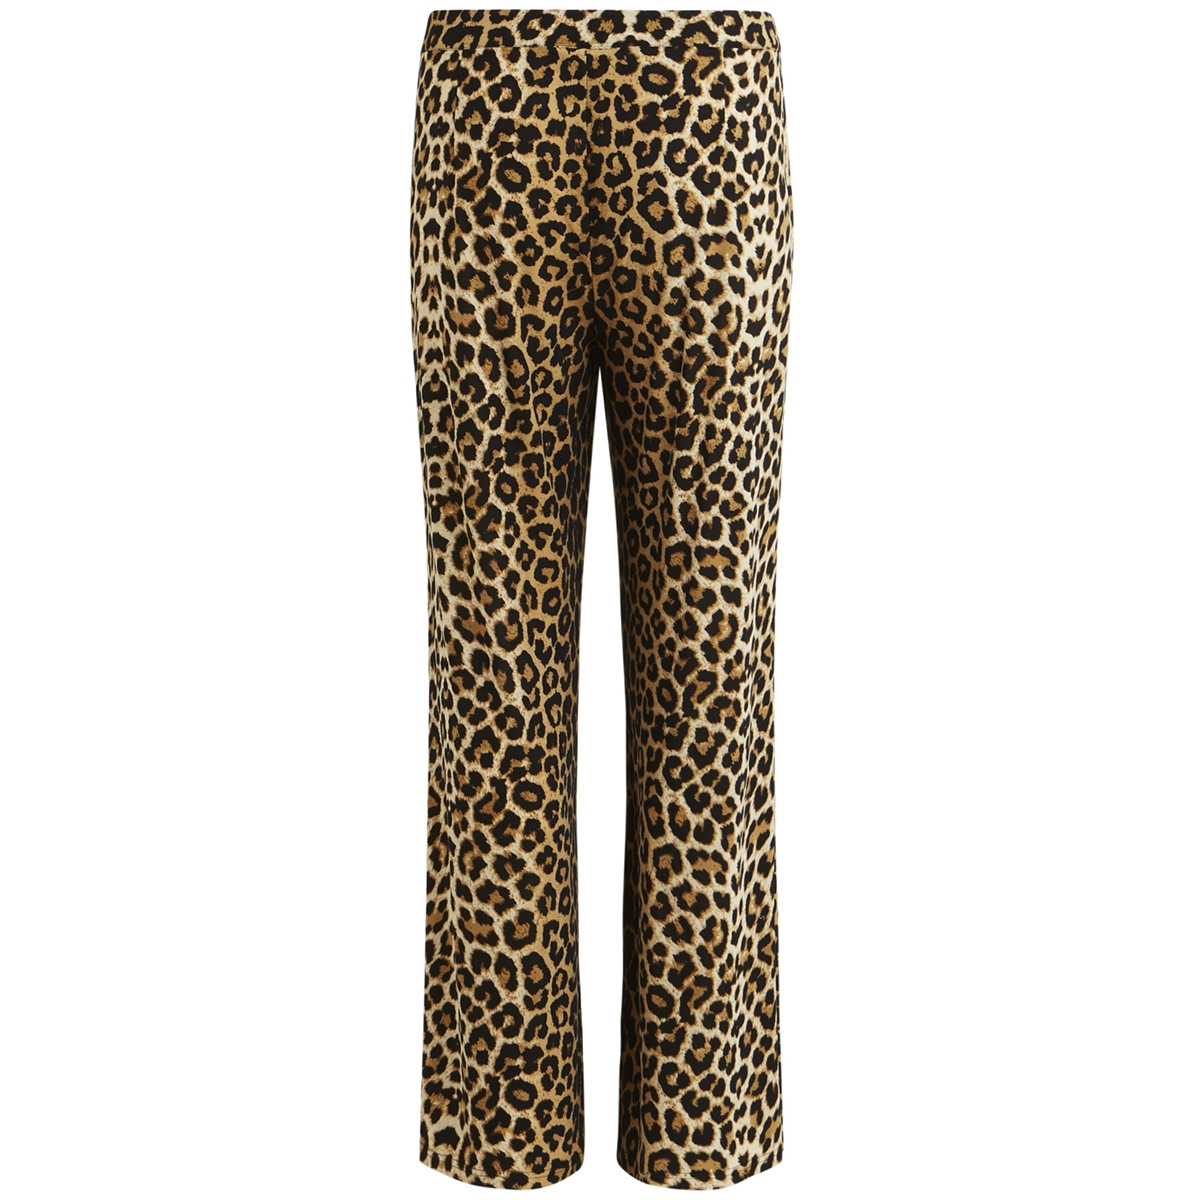 vitabene pants/rx 14048120 vila broek black/animal